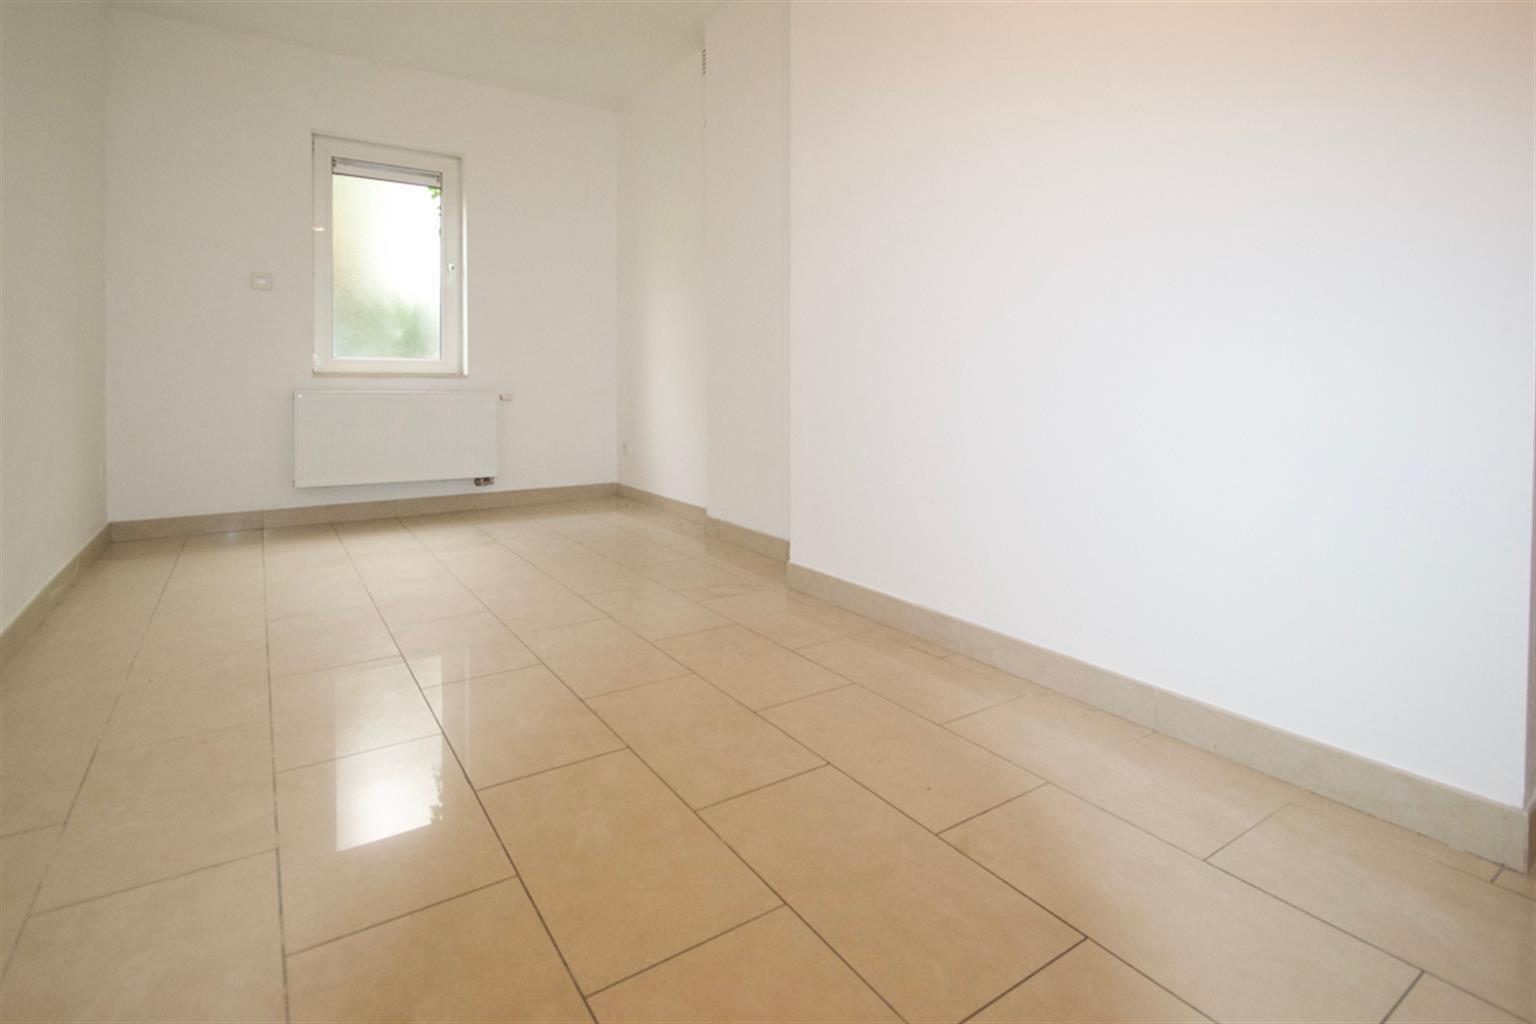 Appartement - Binche Leval-Trahegnies - #4277280-3